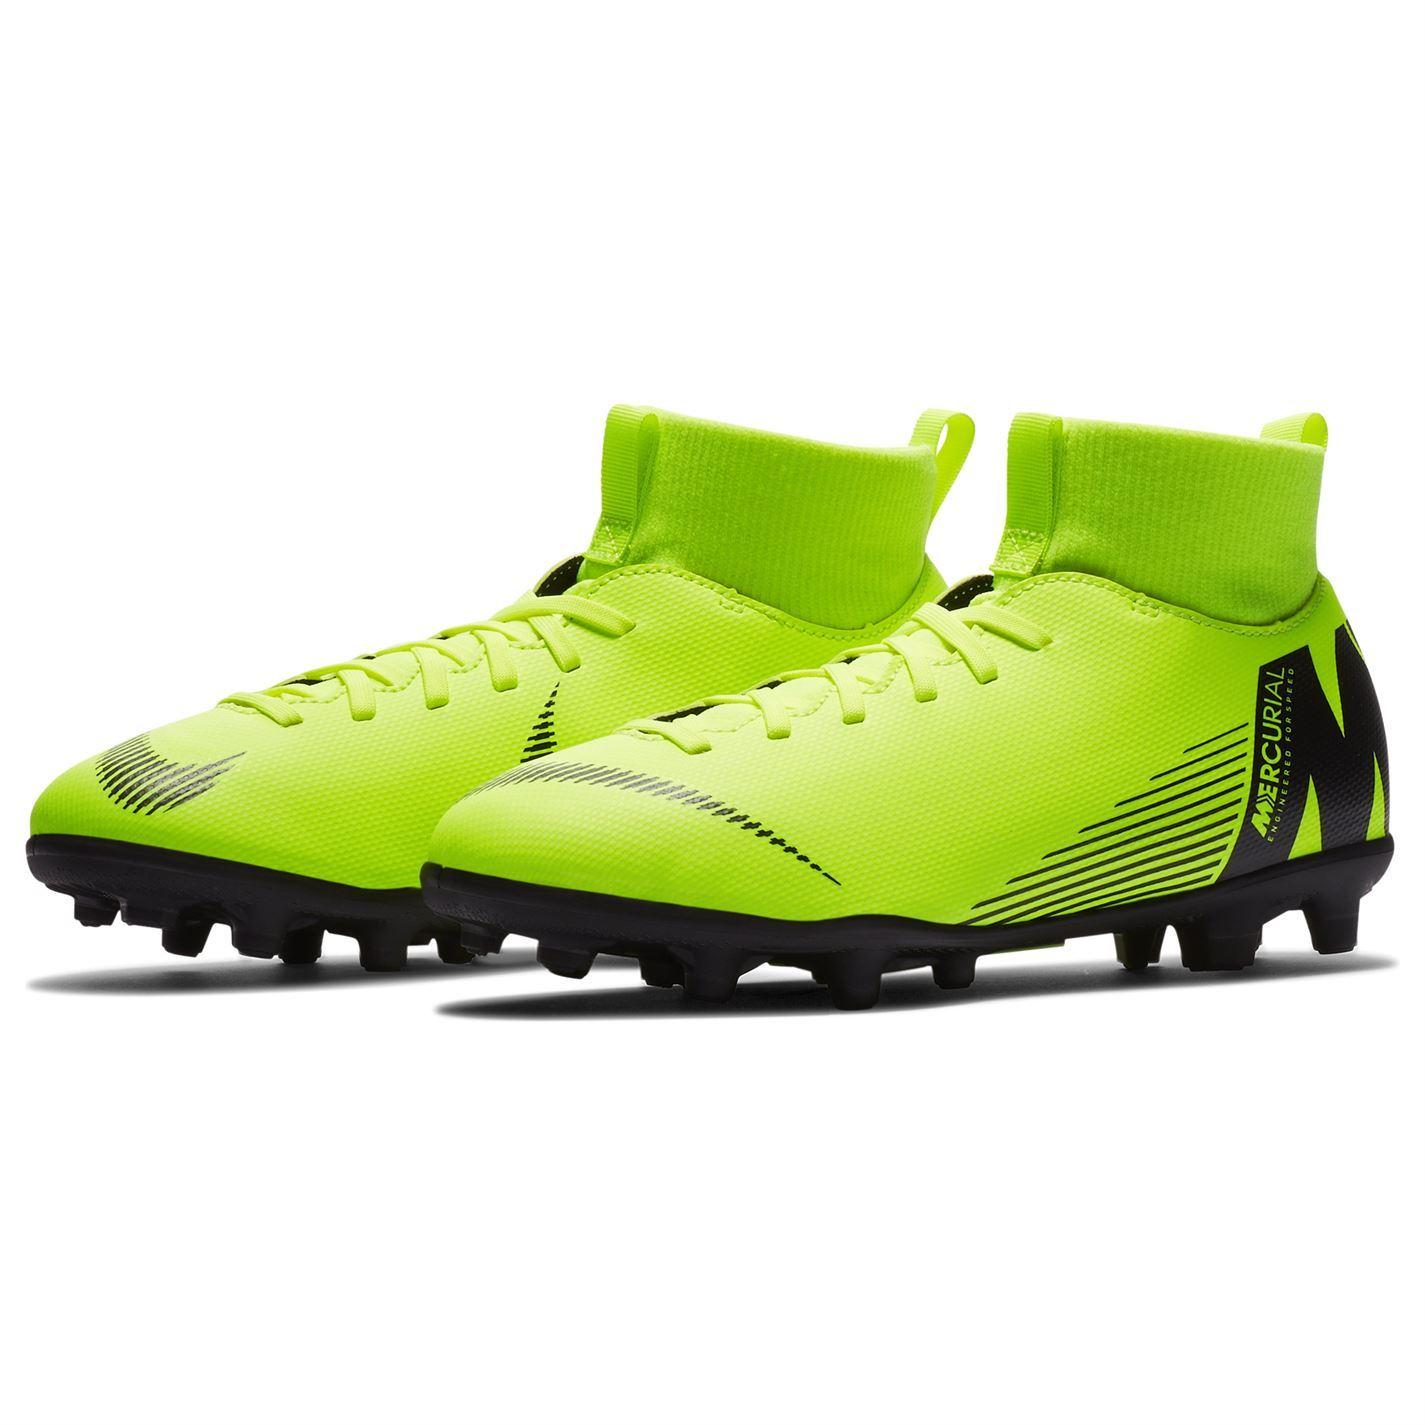 Nike-MERCURIAL-SUPERFLY-Club-DF-TERRA-FERMA-SCARPE-DA-CALCIO-JUNIOR-CALCIO-Cunei miniatura 13